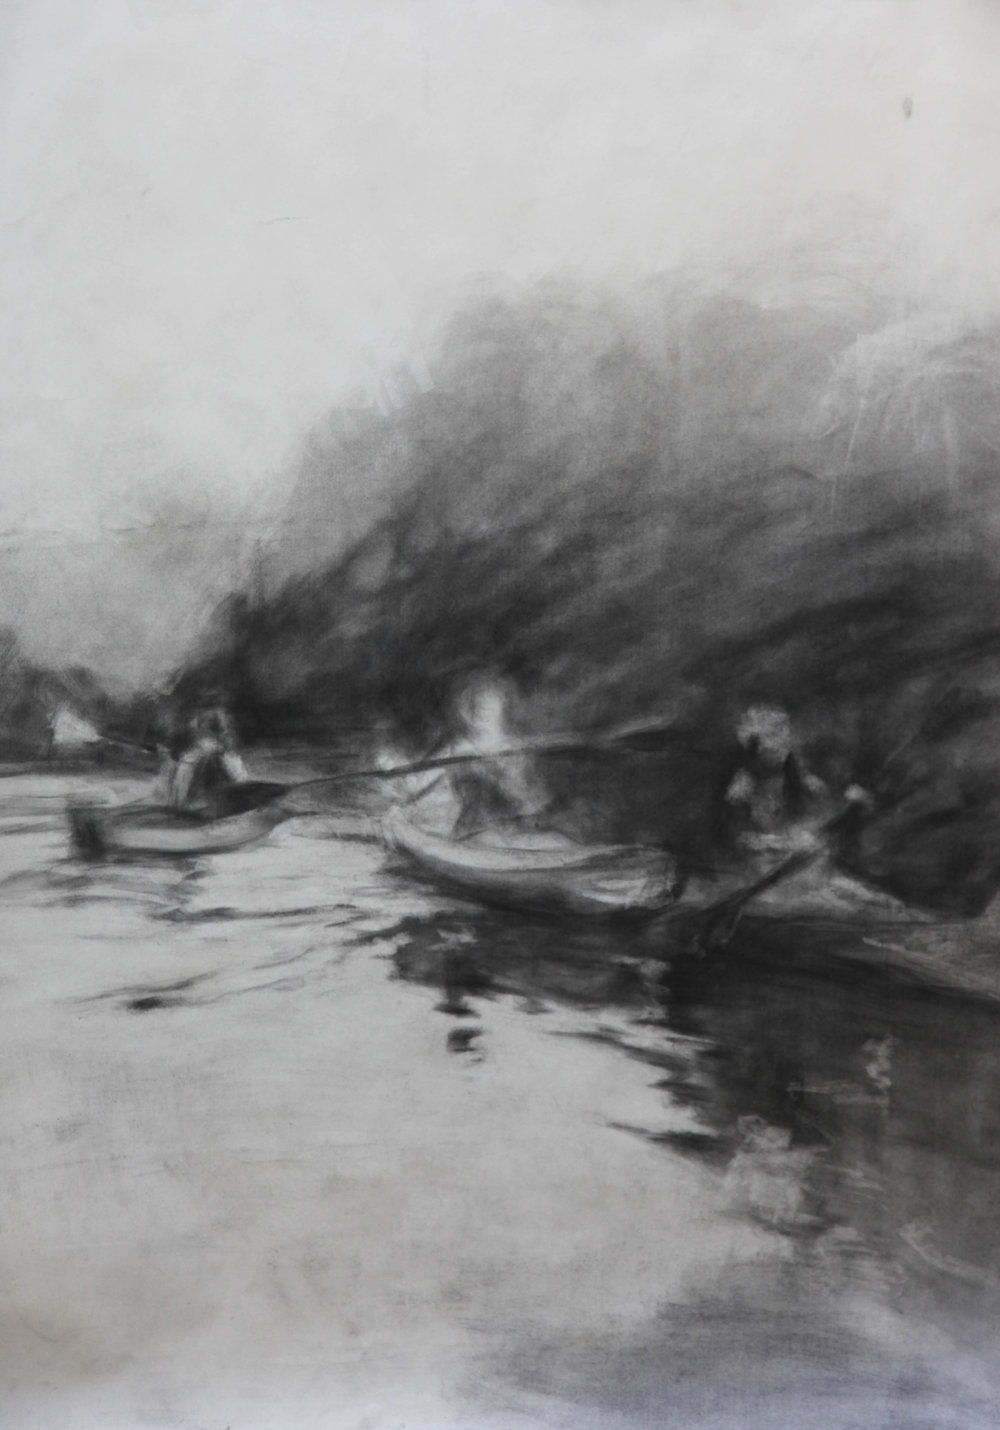 Siri_France_kayakers_48x36.jpg